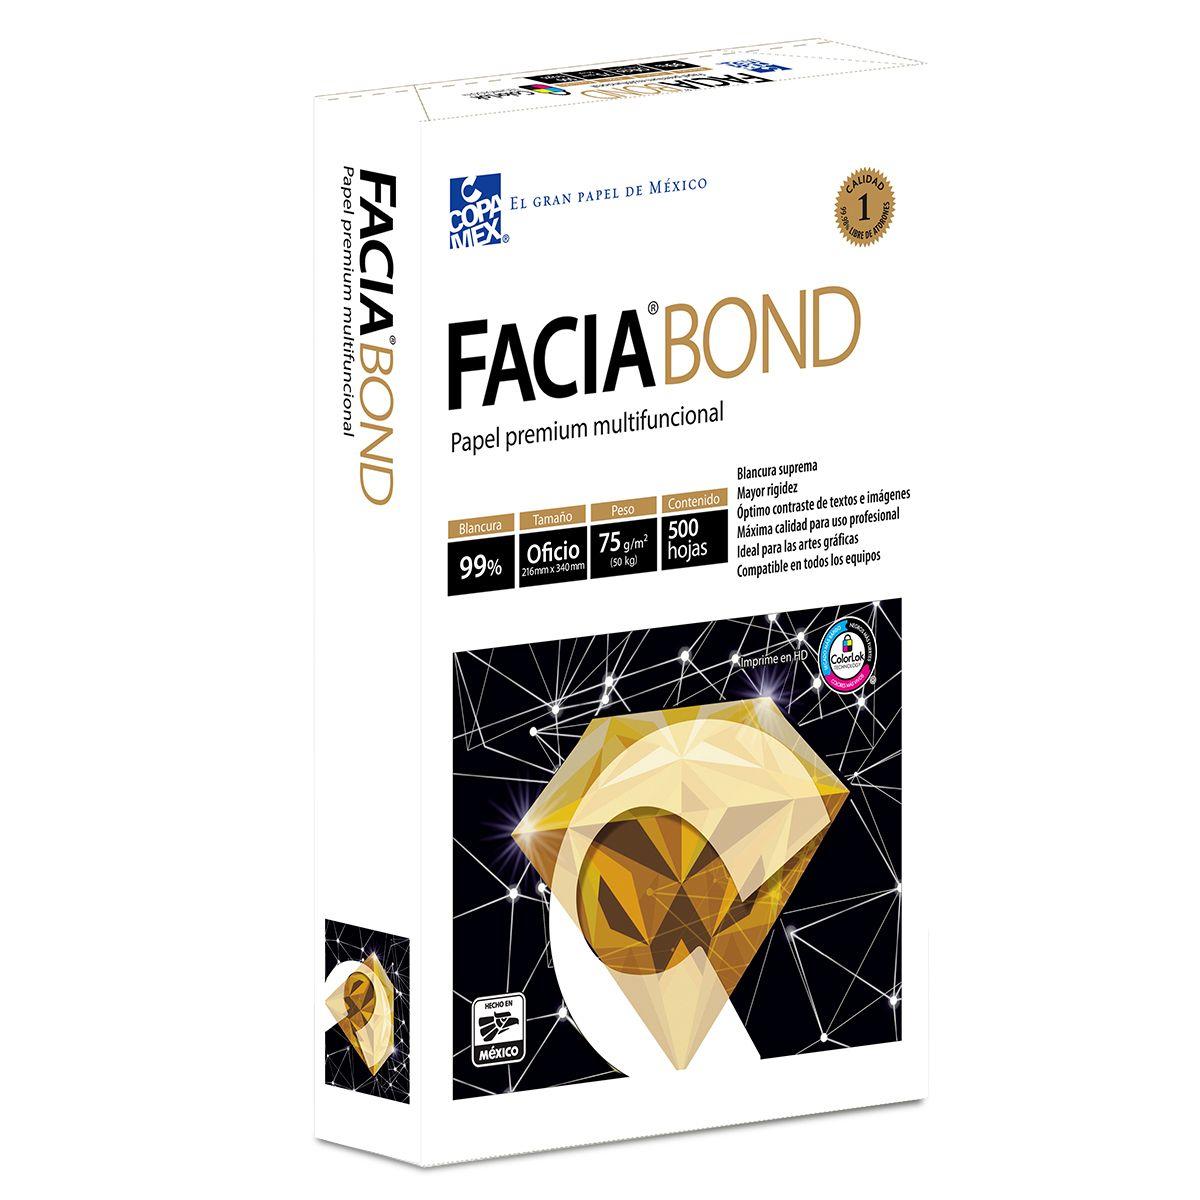 PAPEL FACIA BOND T/OFICIO PAQ.500 HOJAS